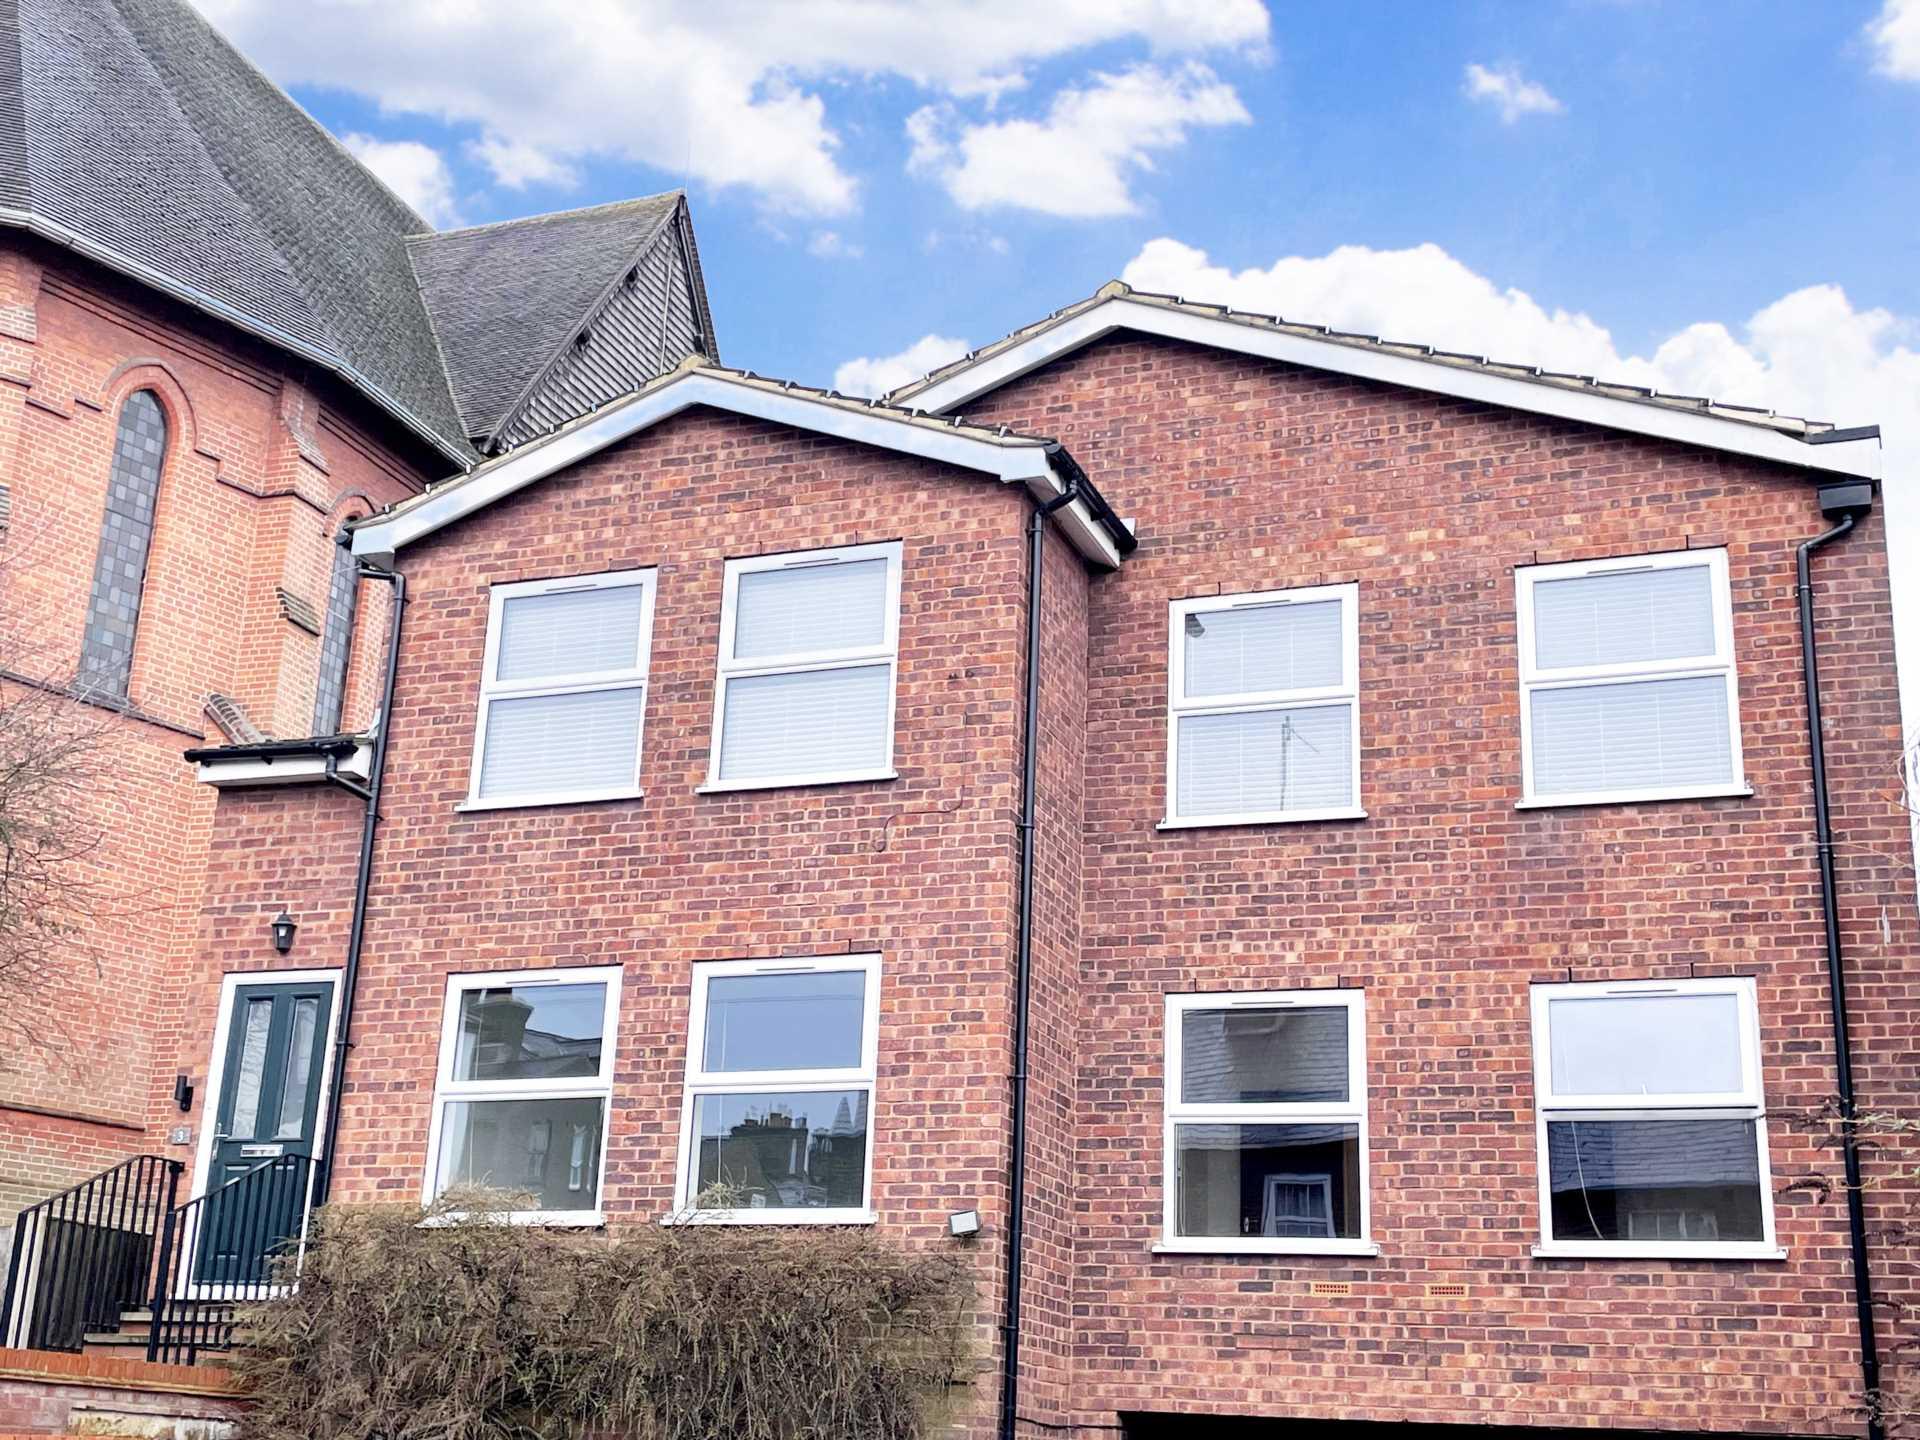 2 Bedroom Apartment, Cross Oak Road, Berkhamsted.